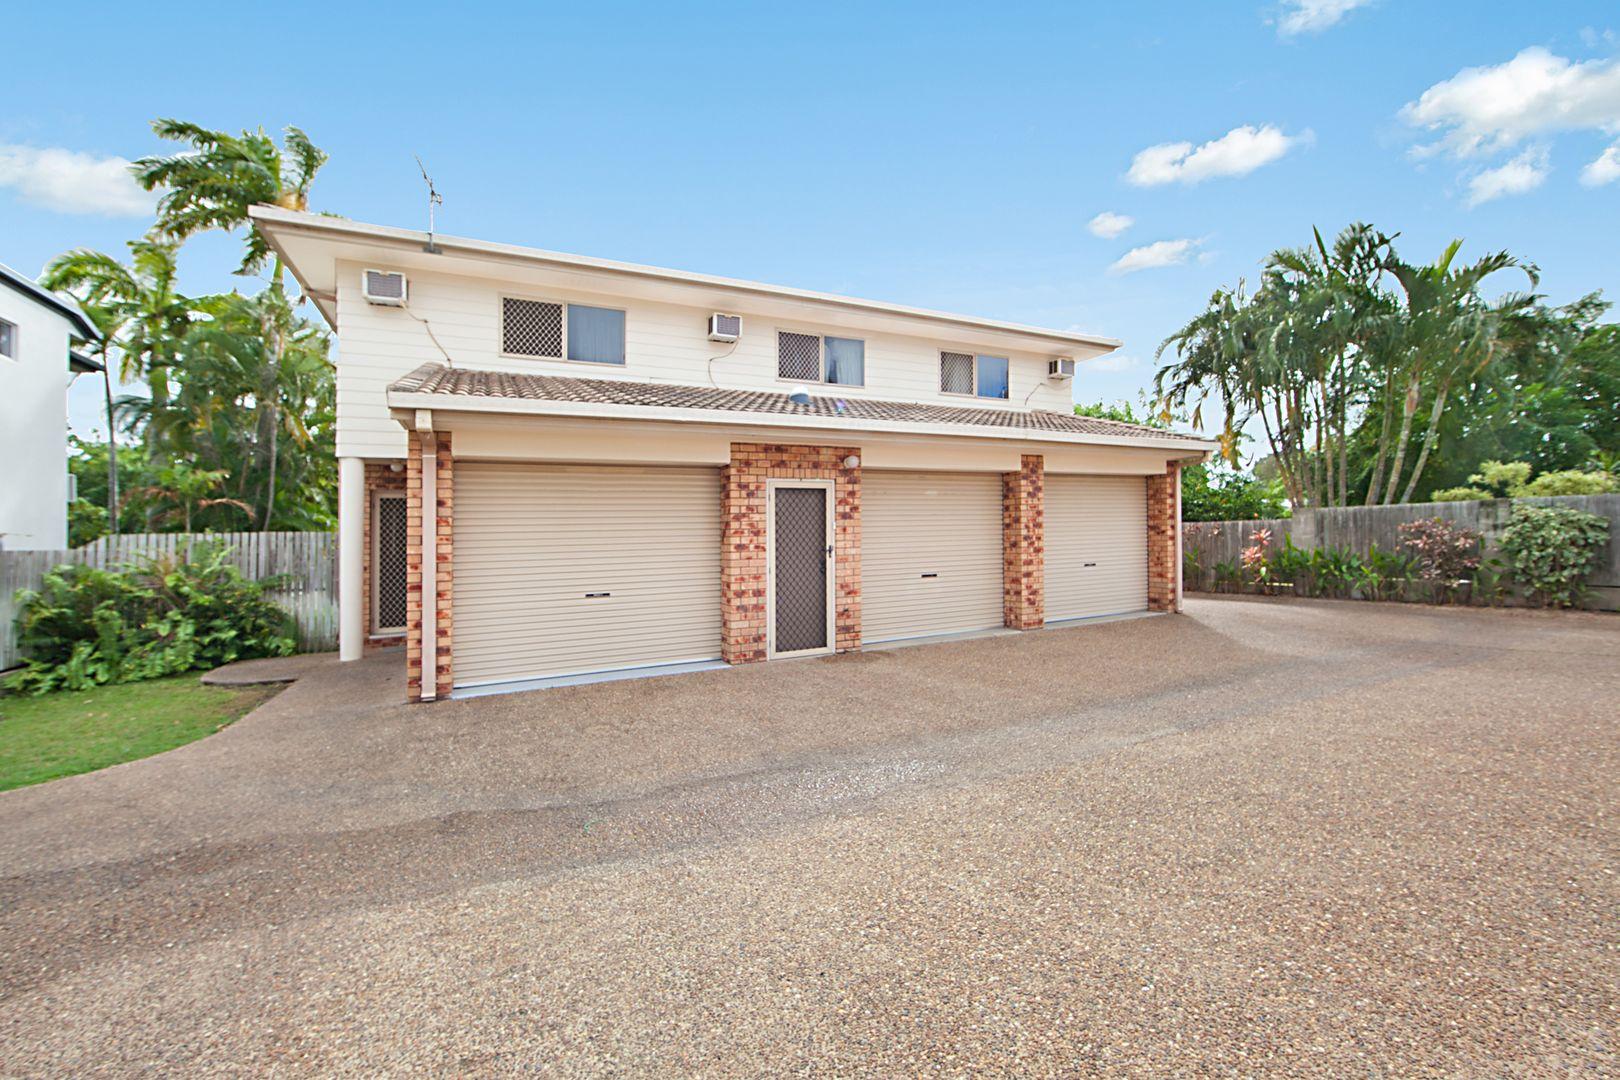 4/13 Primrose Street, North Ward QLD 4810, Image 0